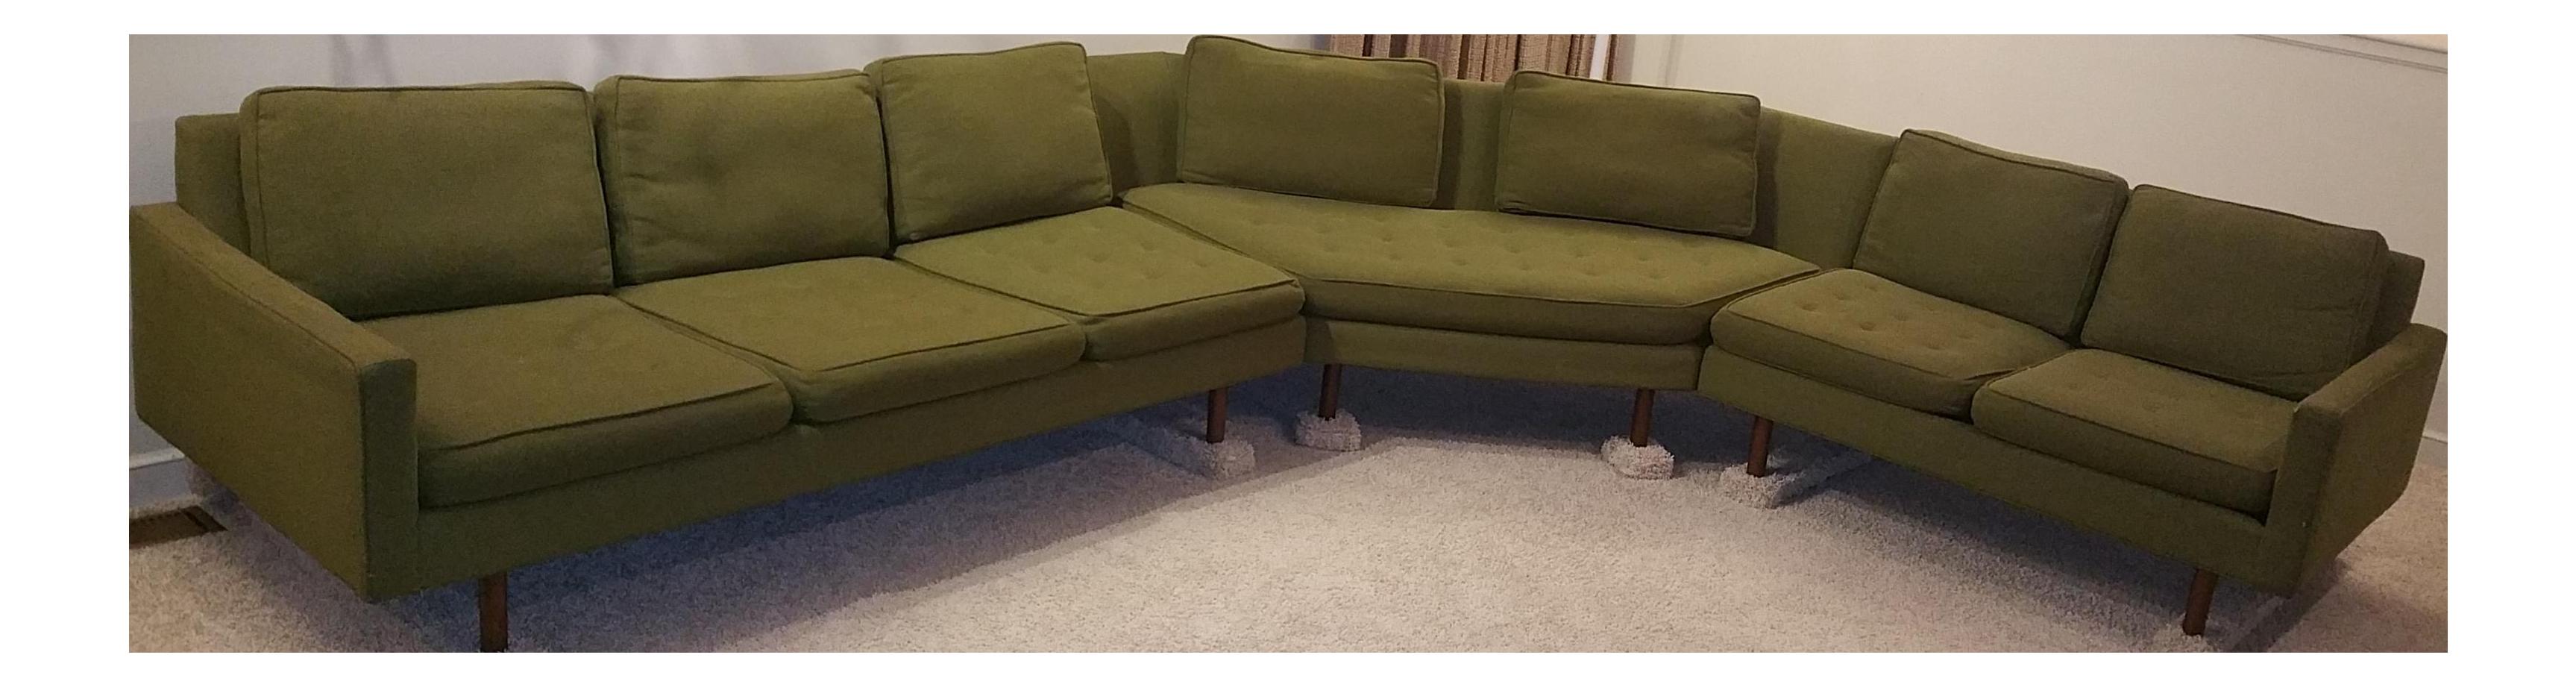 1964 Vintage Thayer Coggin 3 Piece Sectional Sofa Chairish